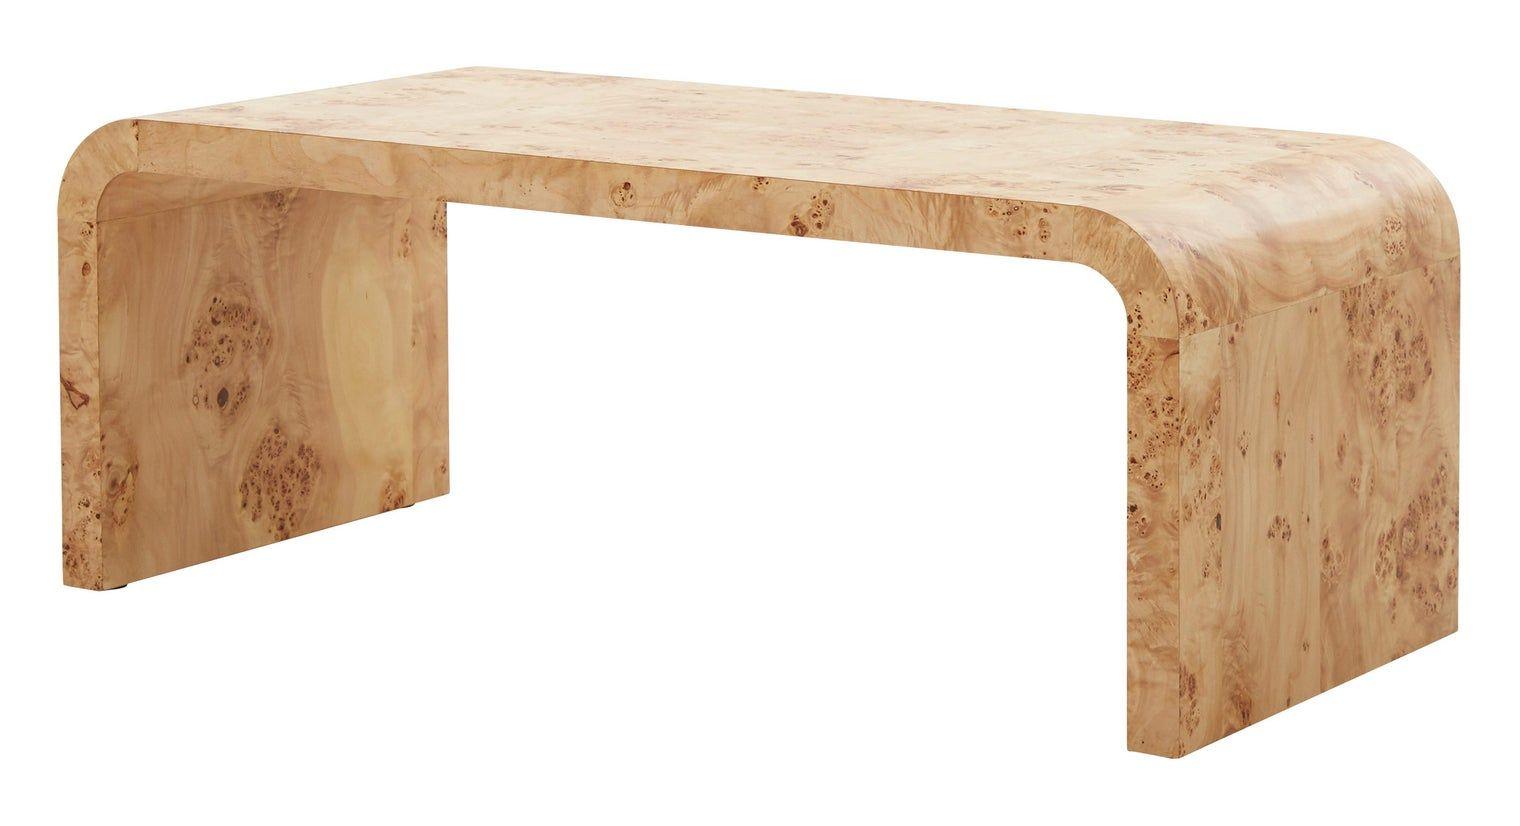 Powell Coffee Table In 2020 Burled Wood Coffee Table Burled Wood Furniture Chic Coffee Table